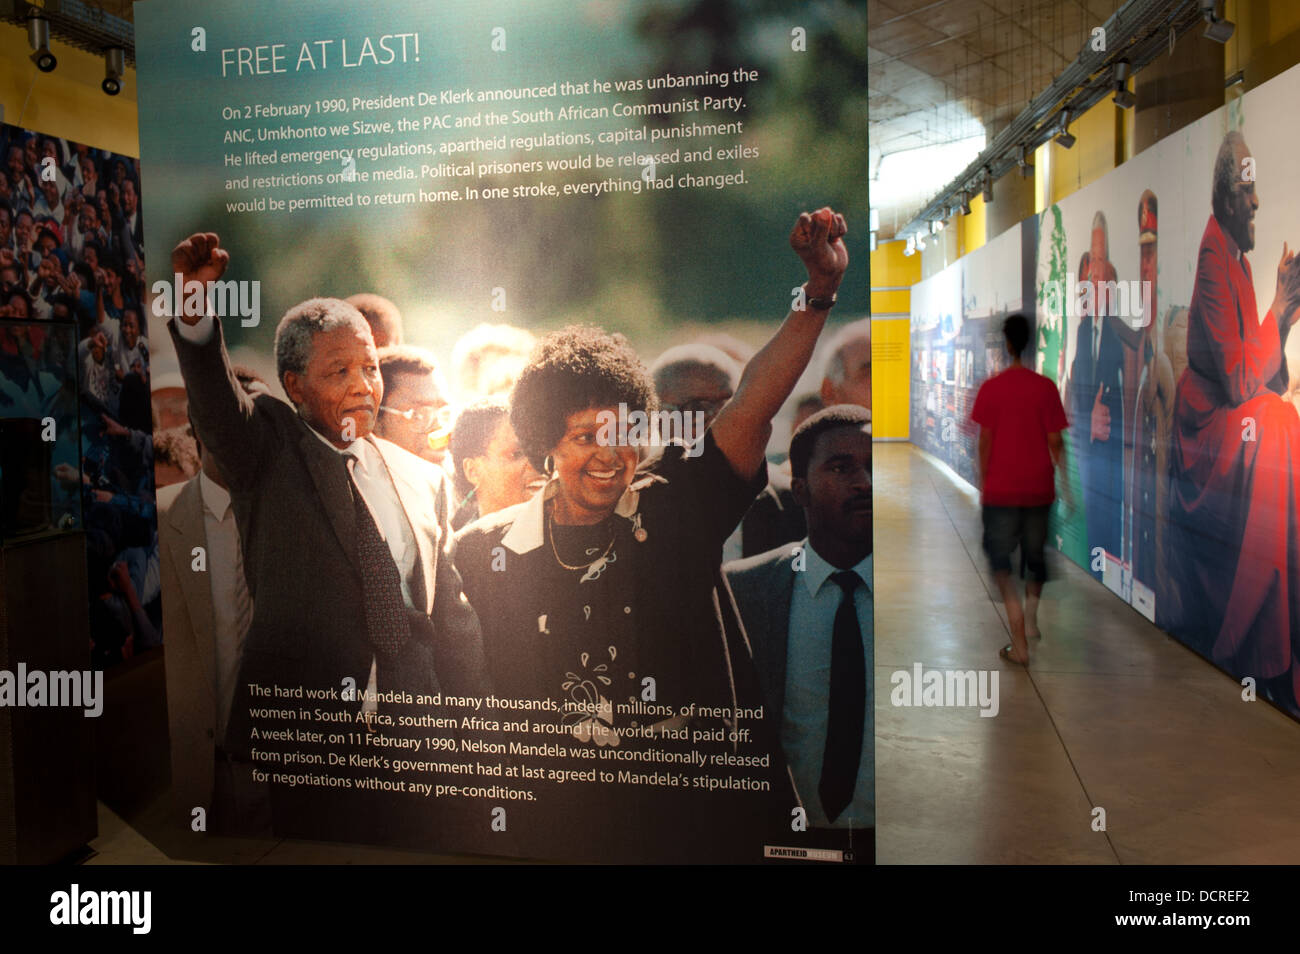 Apartheid Museum, Johannesburg, South Africa - Stock Image